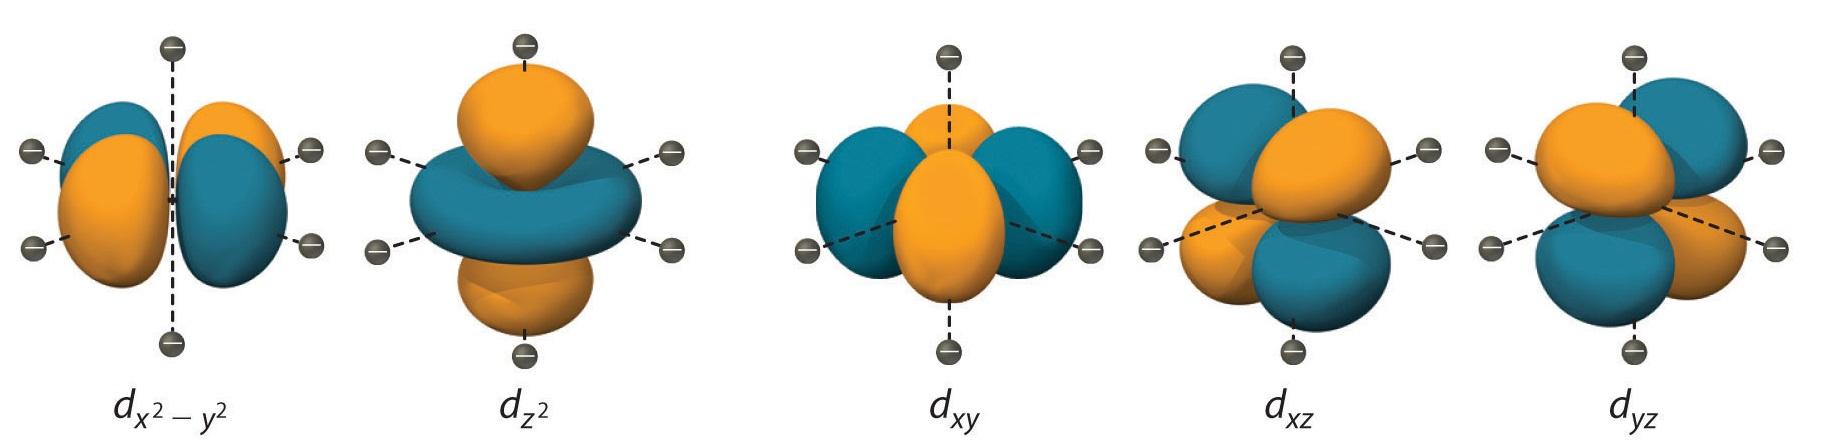 http://chemistryjee.blogspot.ro/2015/08/crystal-field-theory.html